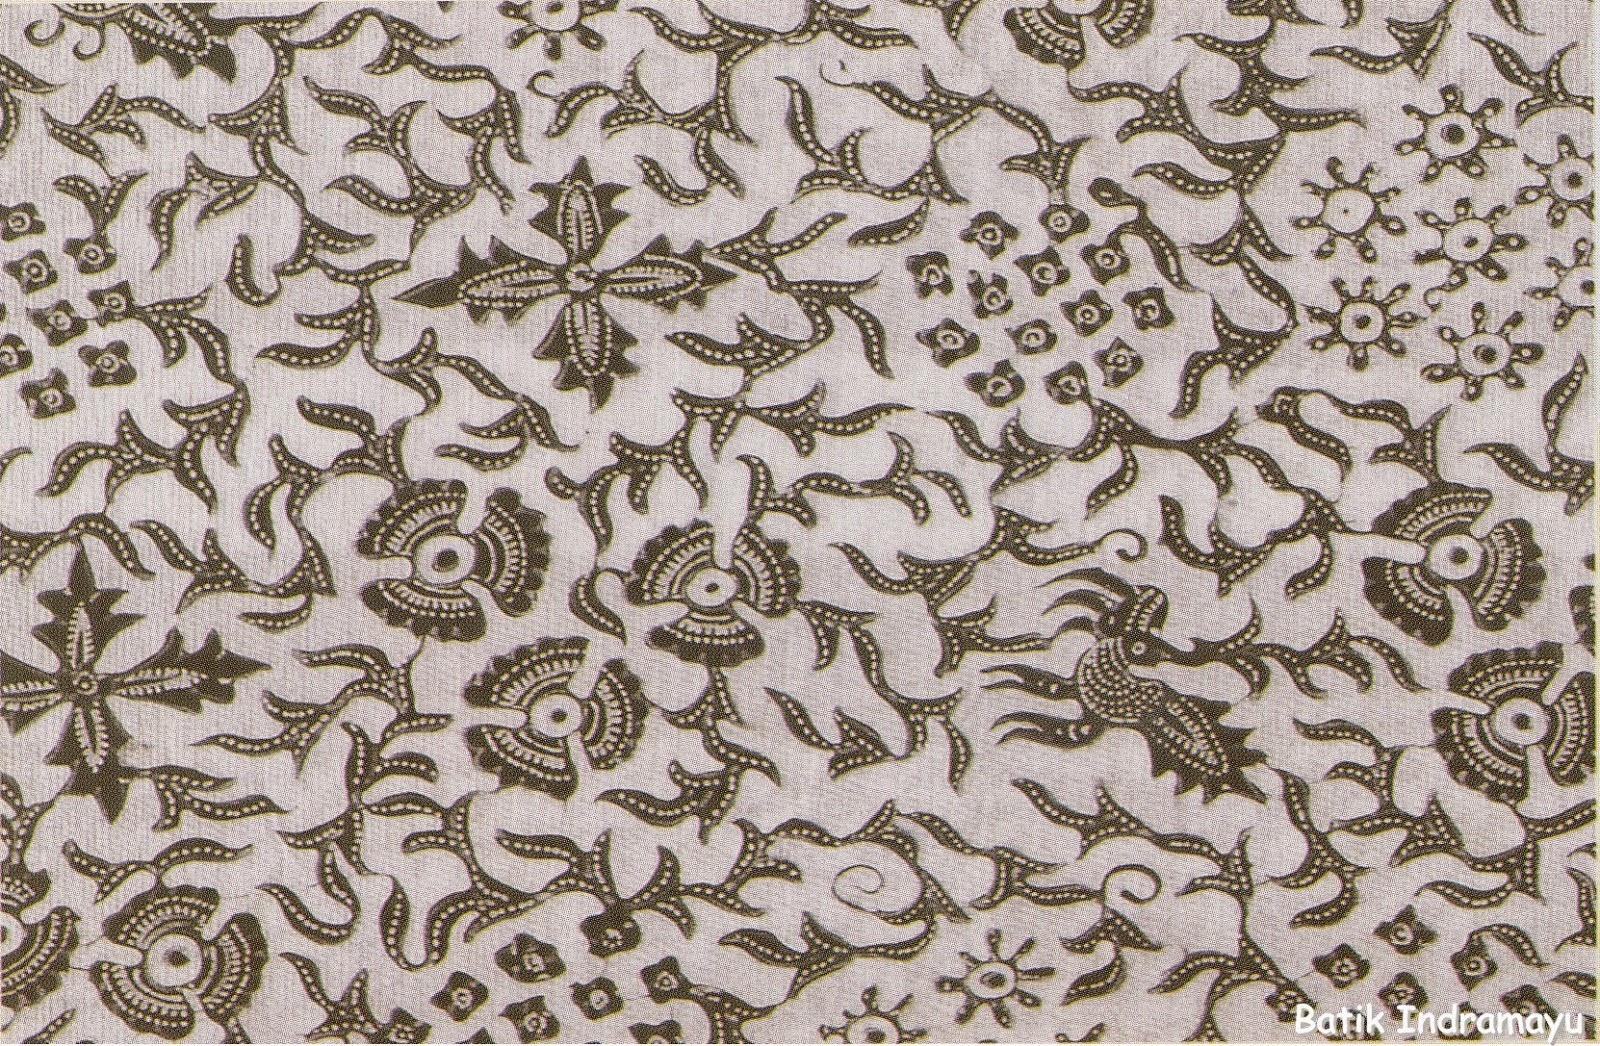 kain batik indramayu